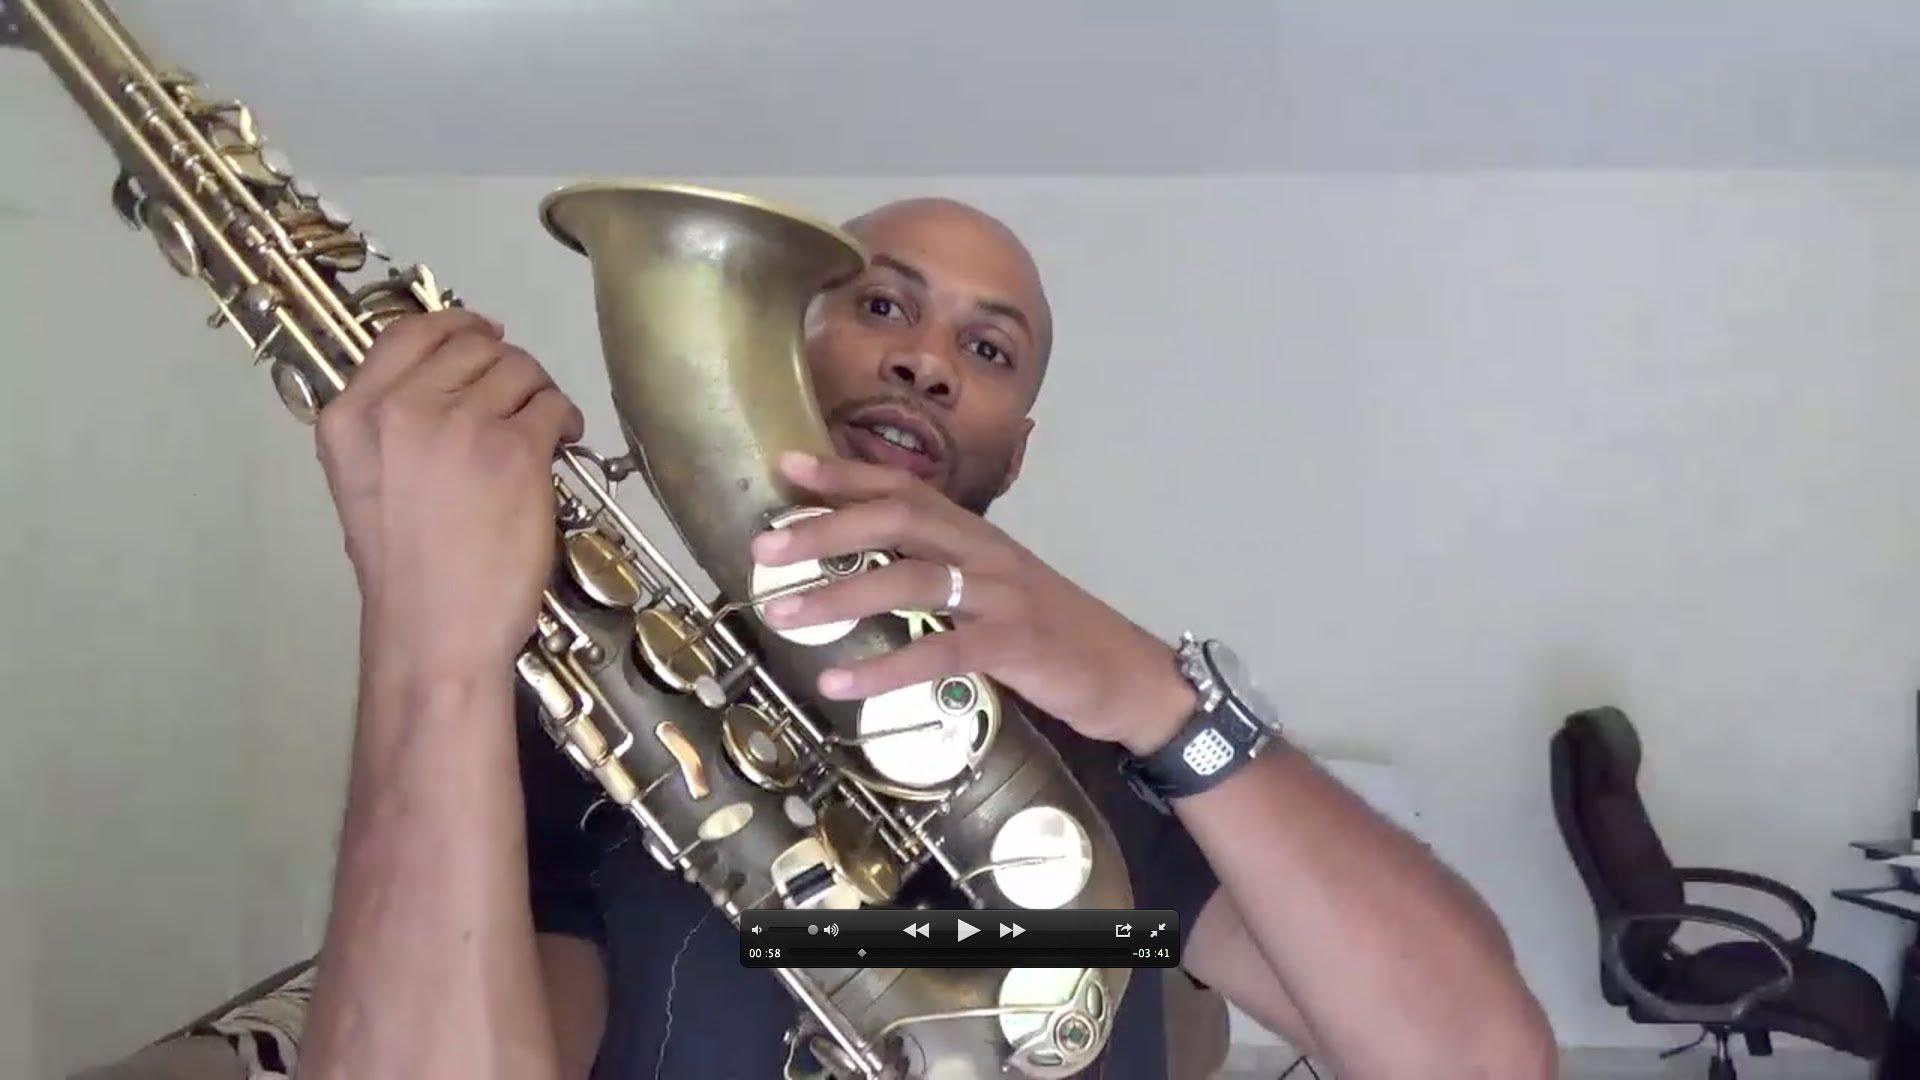 marque de saxophone